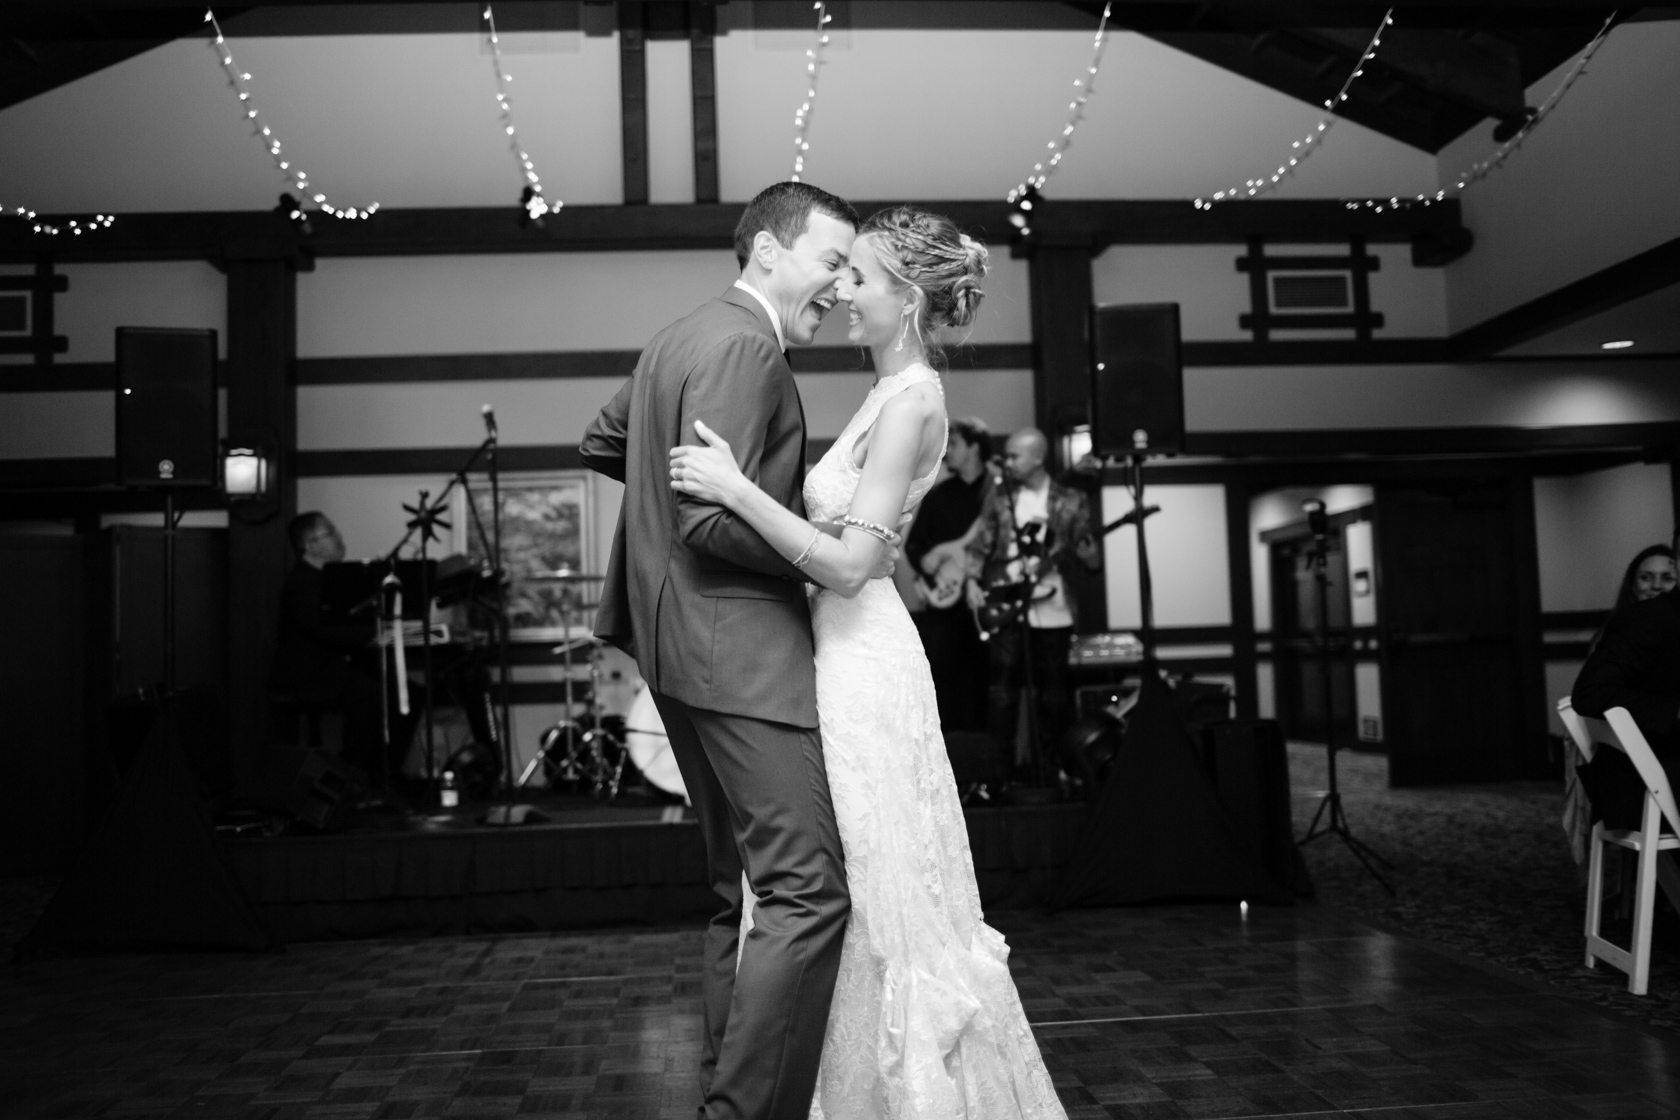 The_Lodge_at_Torrey_Pines_Wedding_094.jpg